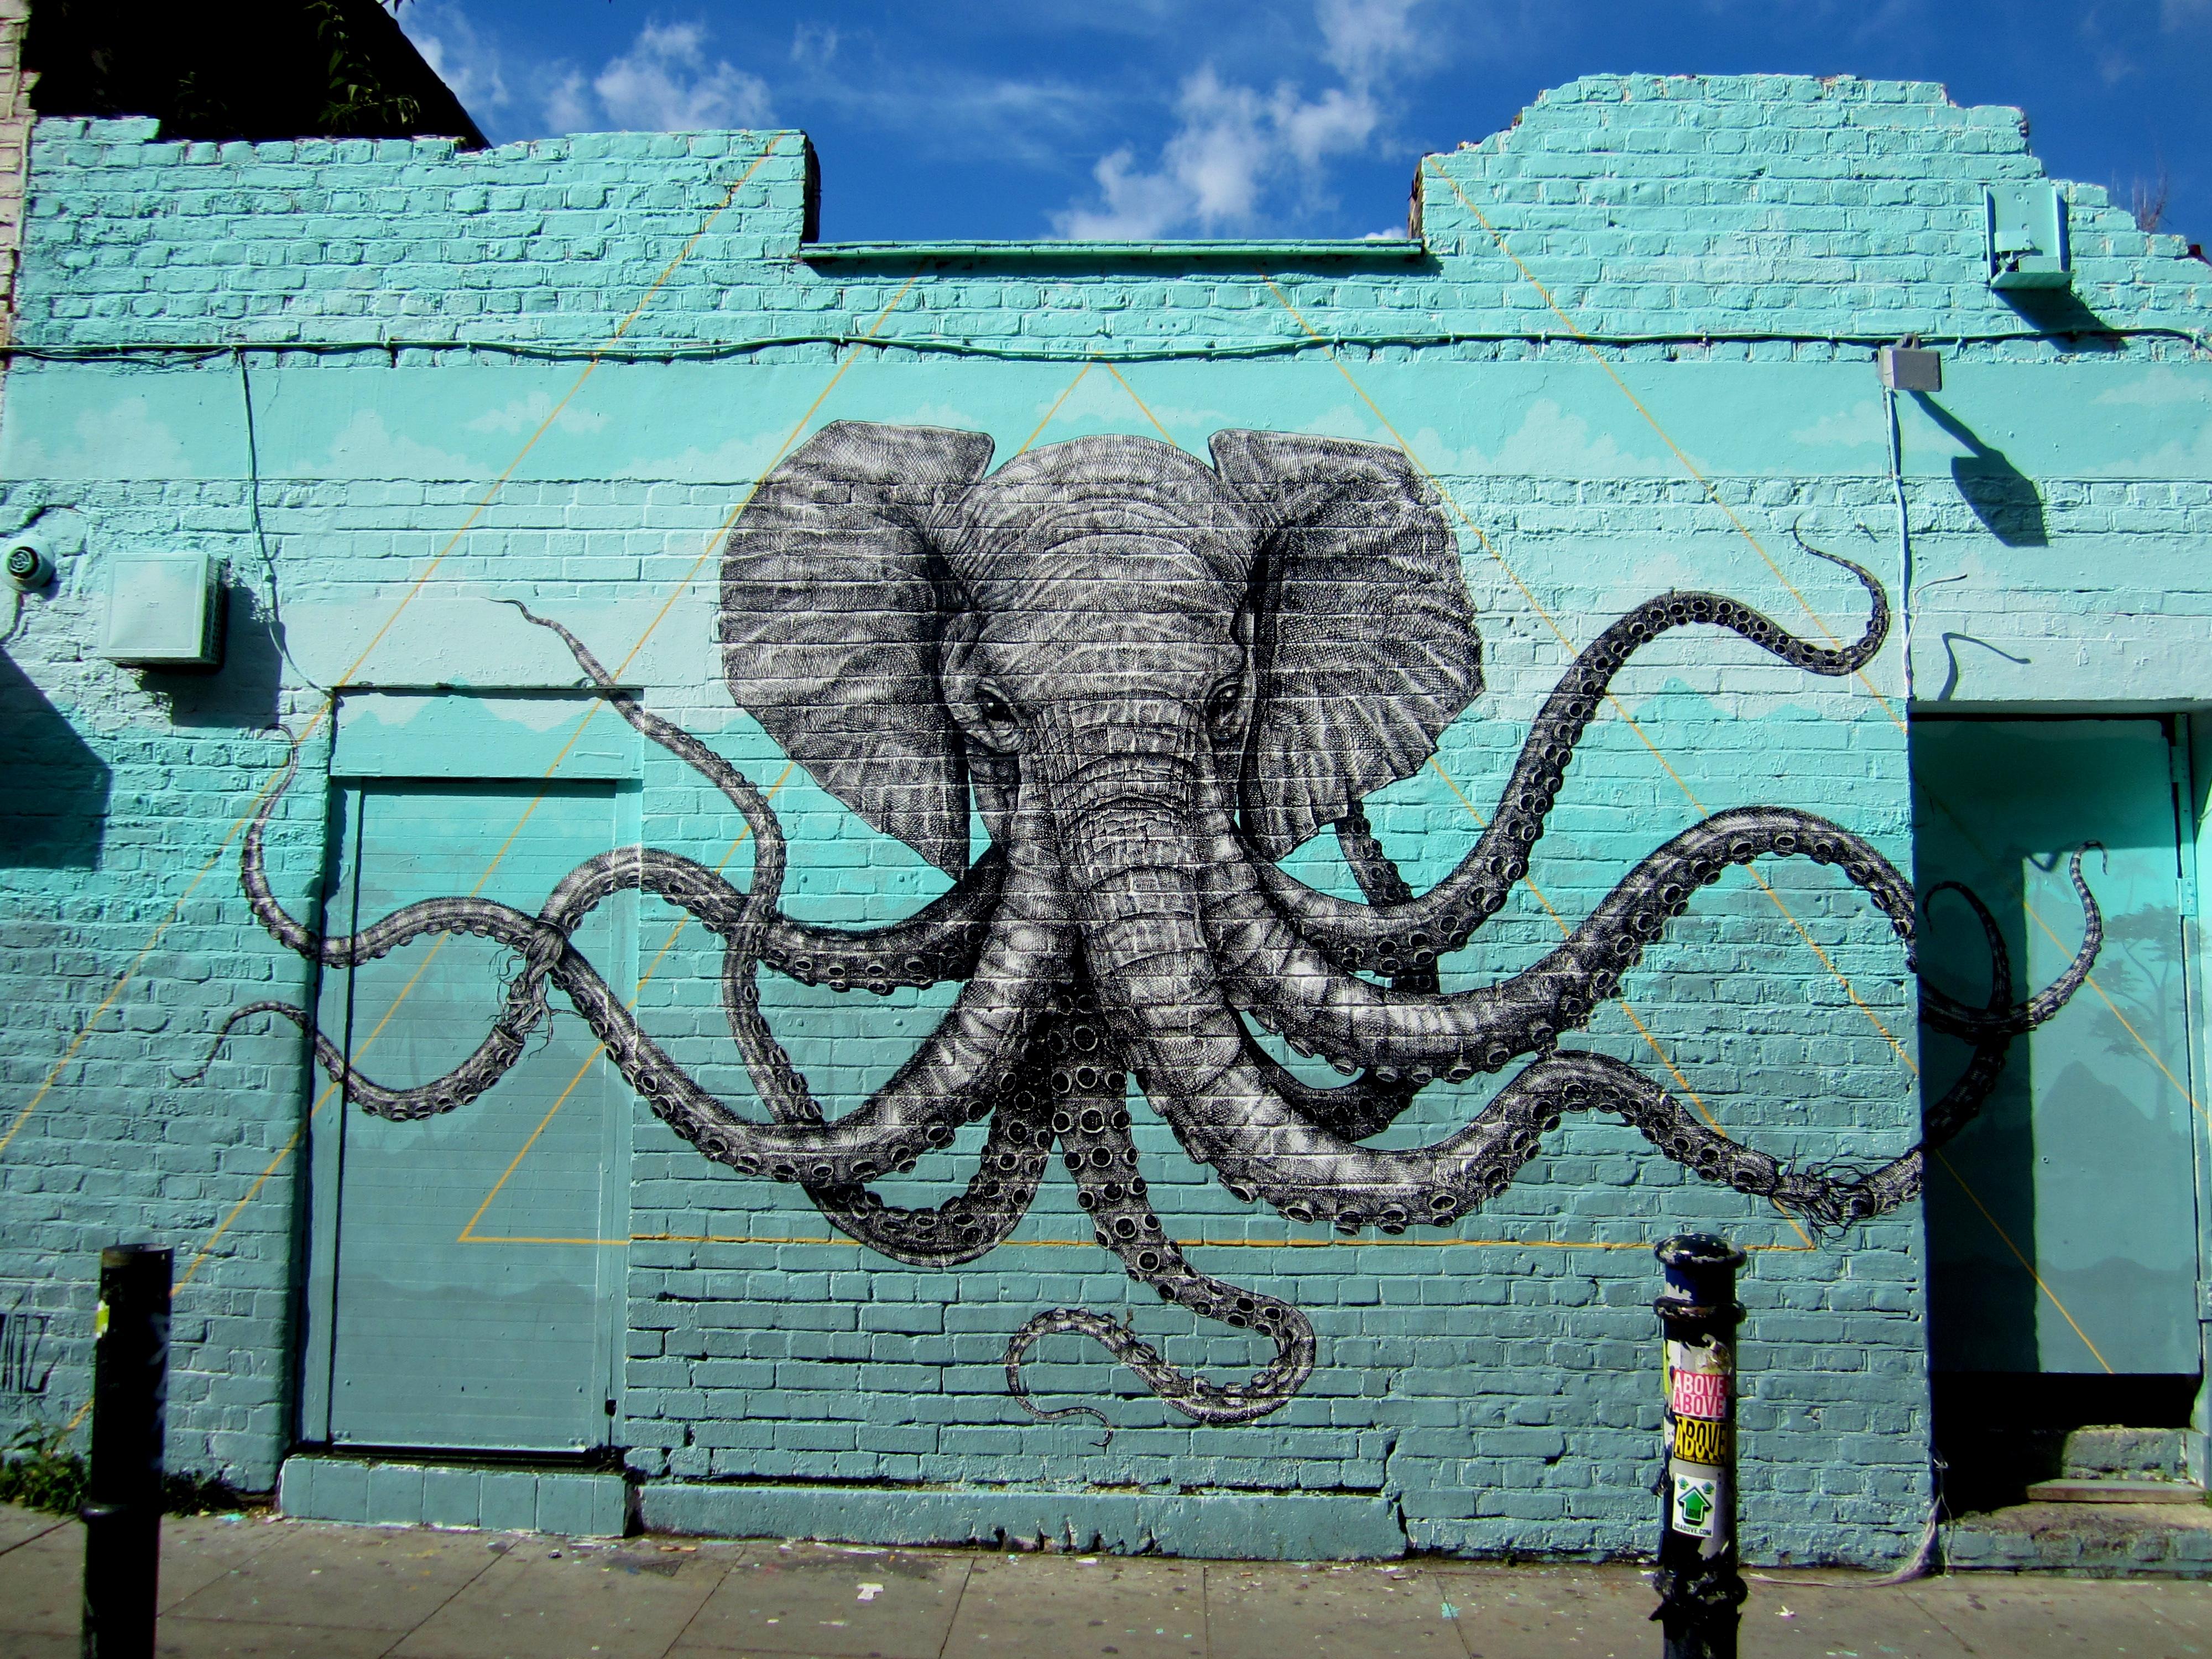 Street Art Walking Tour around East London – The Well